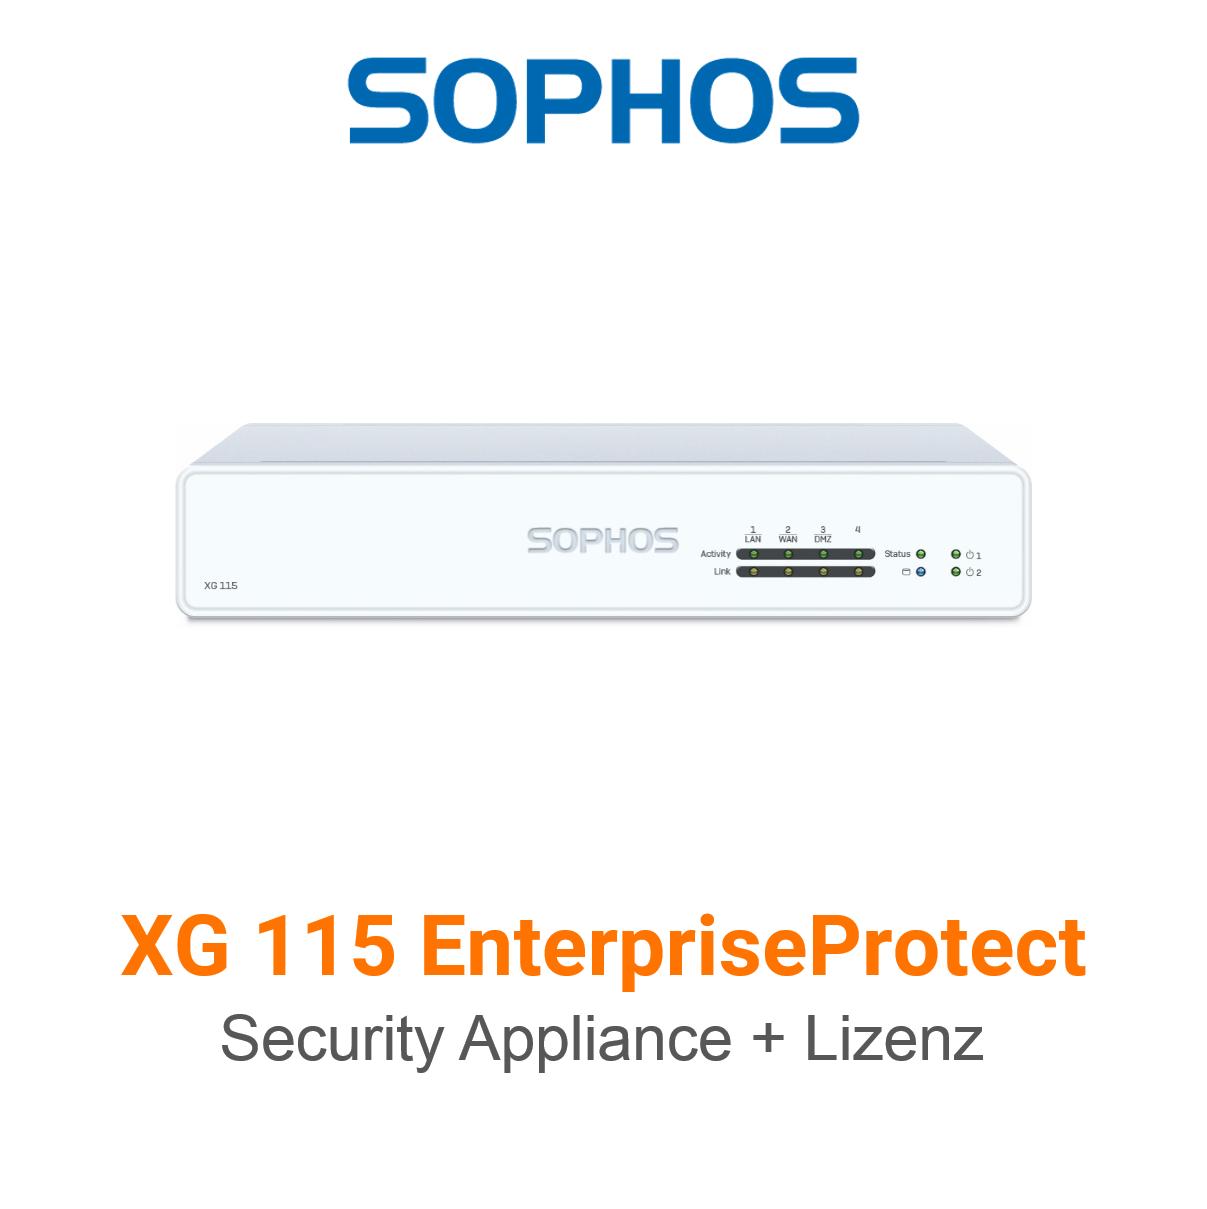 Sophos XG 115 EnterpriseProtect Bundle (Hardware + Lizenz)